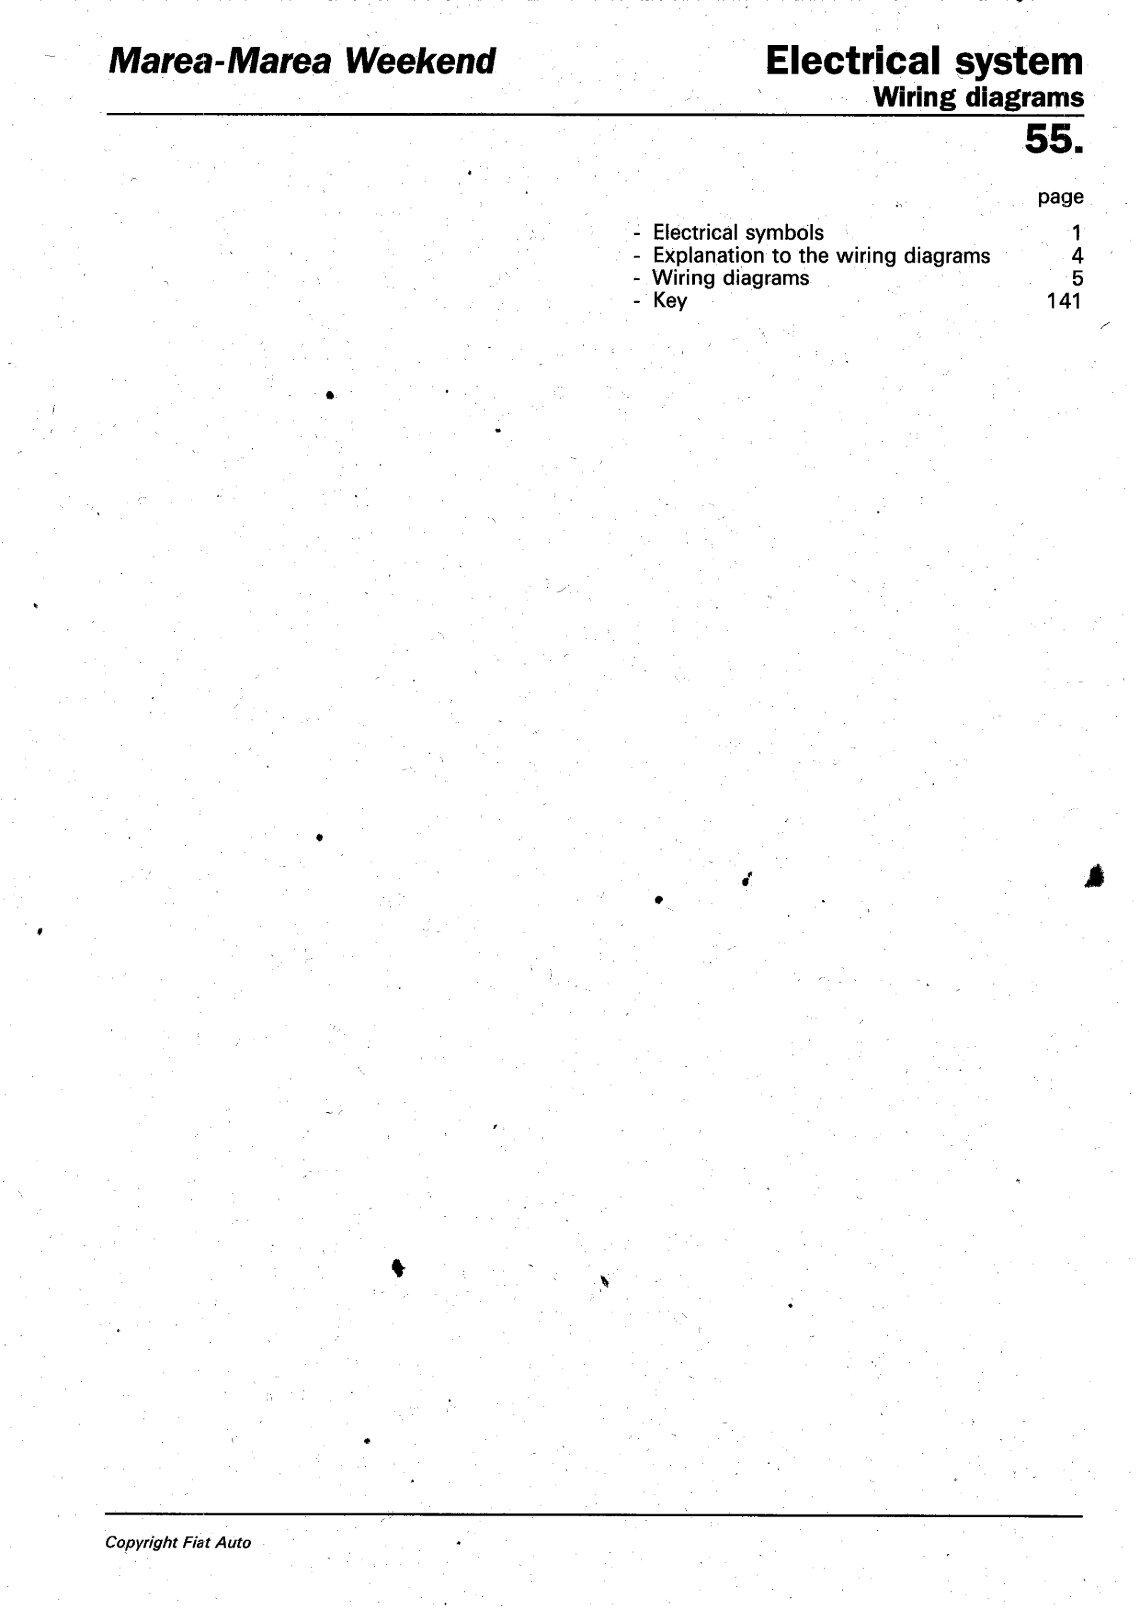 fiat palio wiring diagram pdf simple wirings Bush Hog Wiring Diagram fiat palio weekend wiring diagram question about wiring diagram \\u2022 1977 fiat 124 spider wiring diagram fiat palio wiring diagram pdf